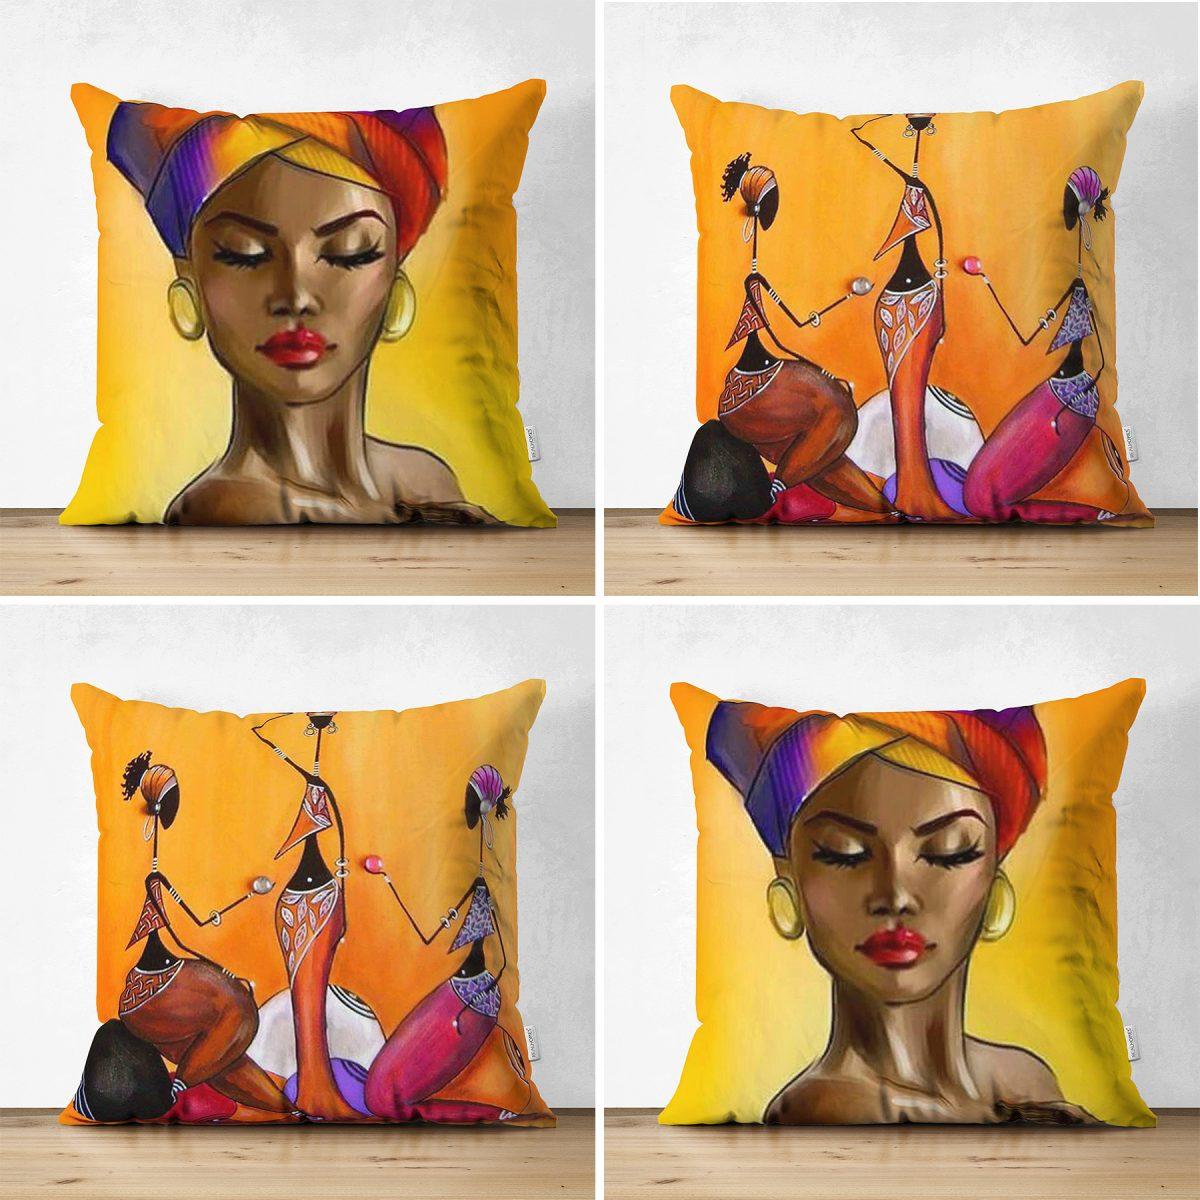 Realhomes Çift Taraflı Afrika Bayan Motifli 4'lü Modern Süet Yastık Kılent Kılıf Seti Realhomes